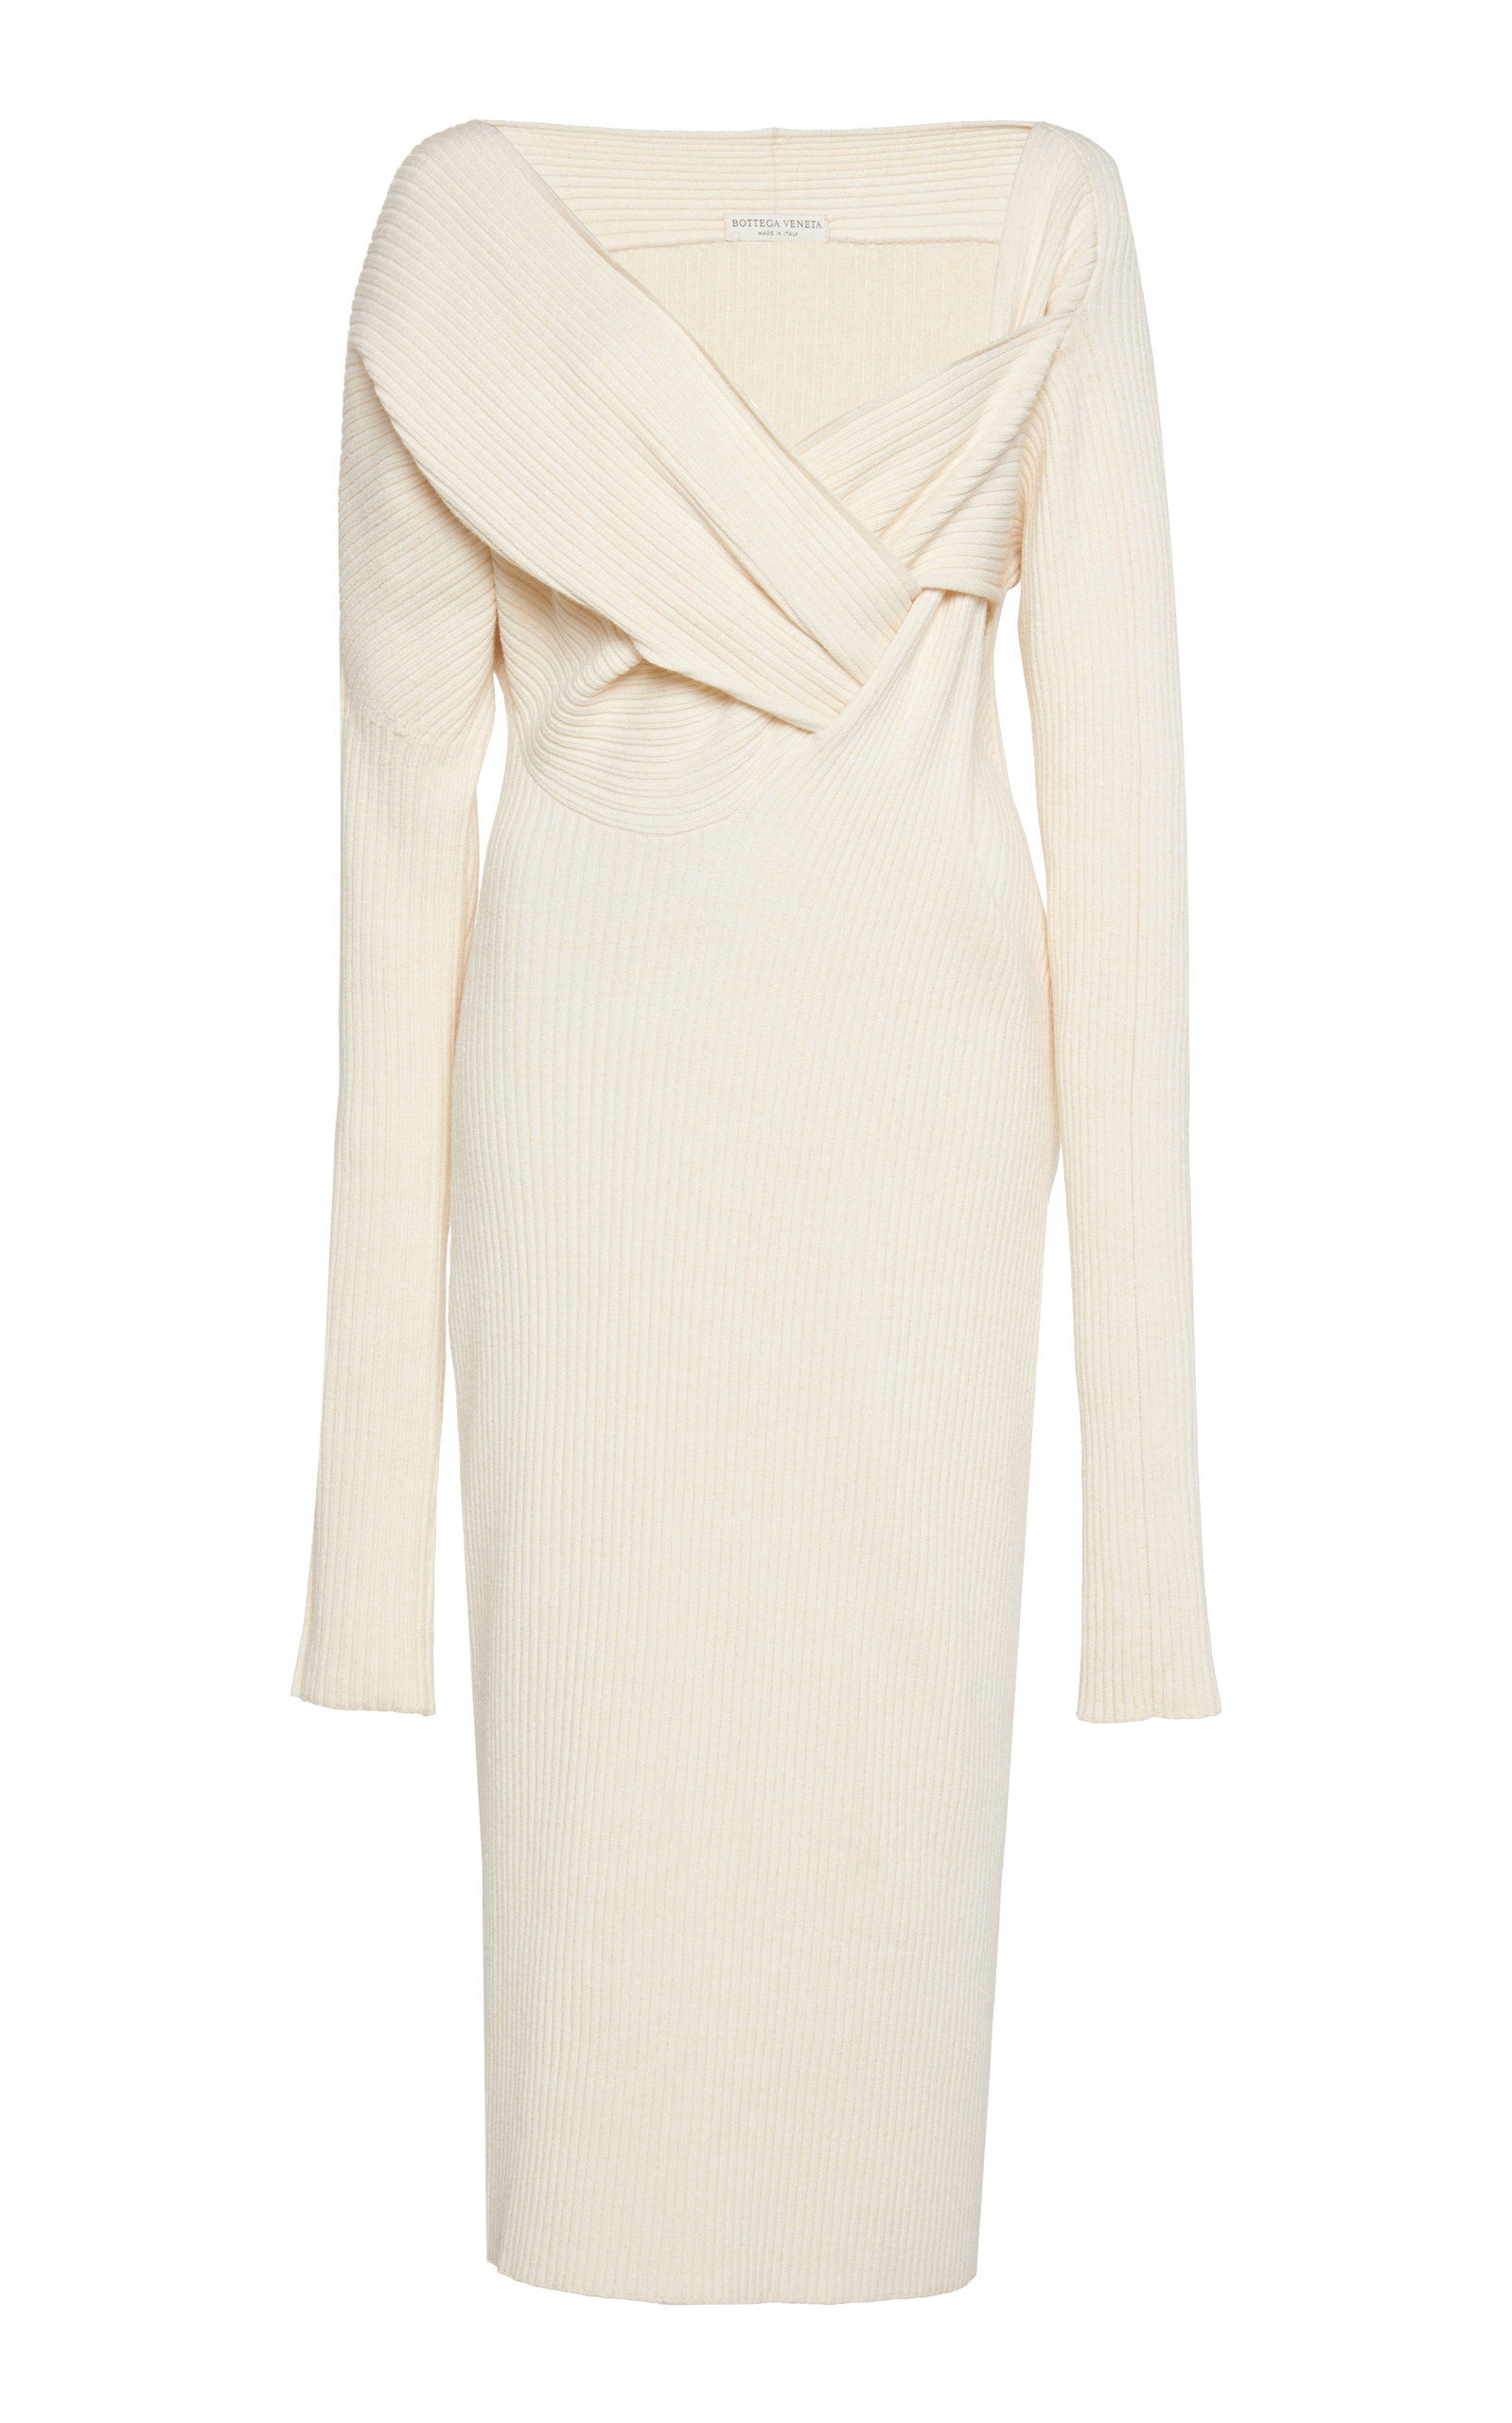 Bottega Veneta Dress Asymmetric Draped Knitted Midi Dress